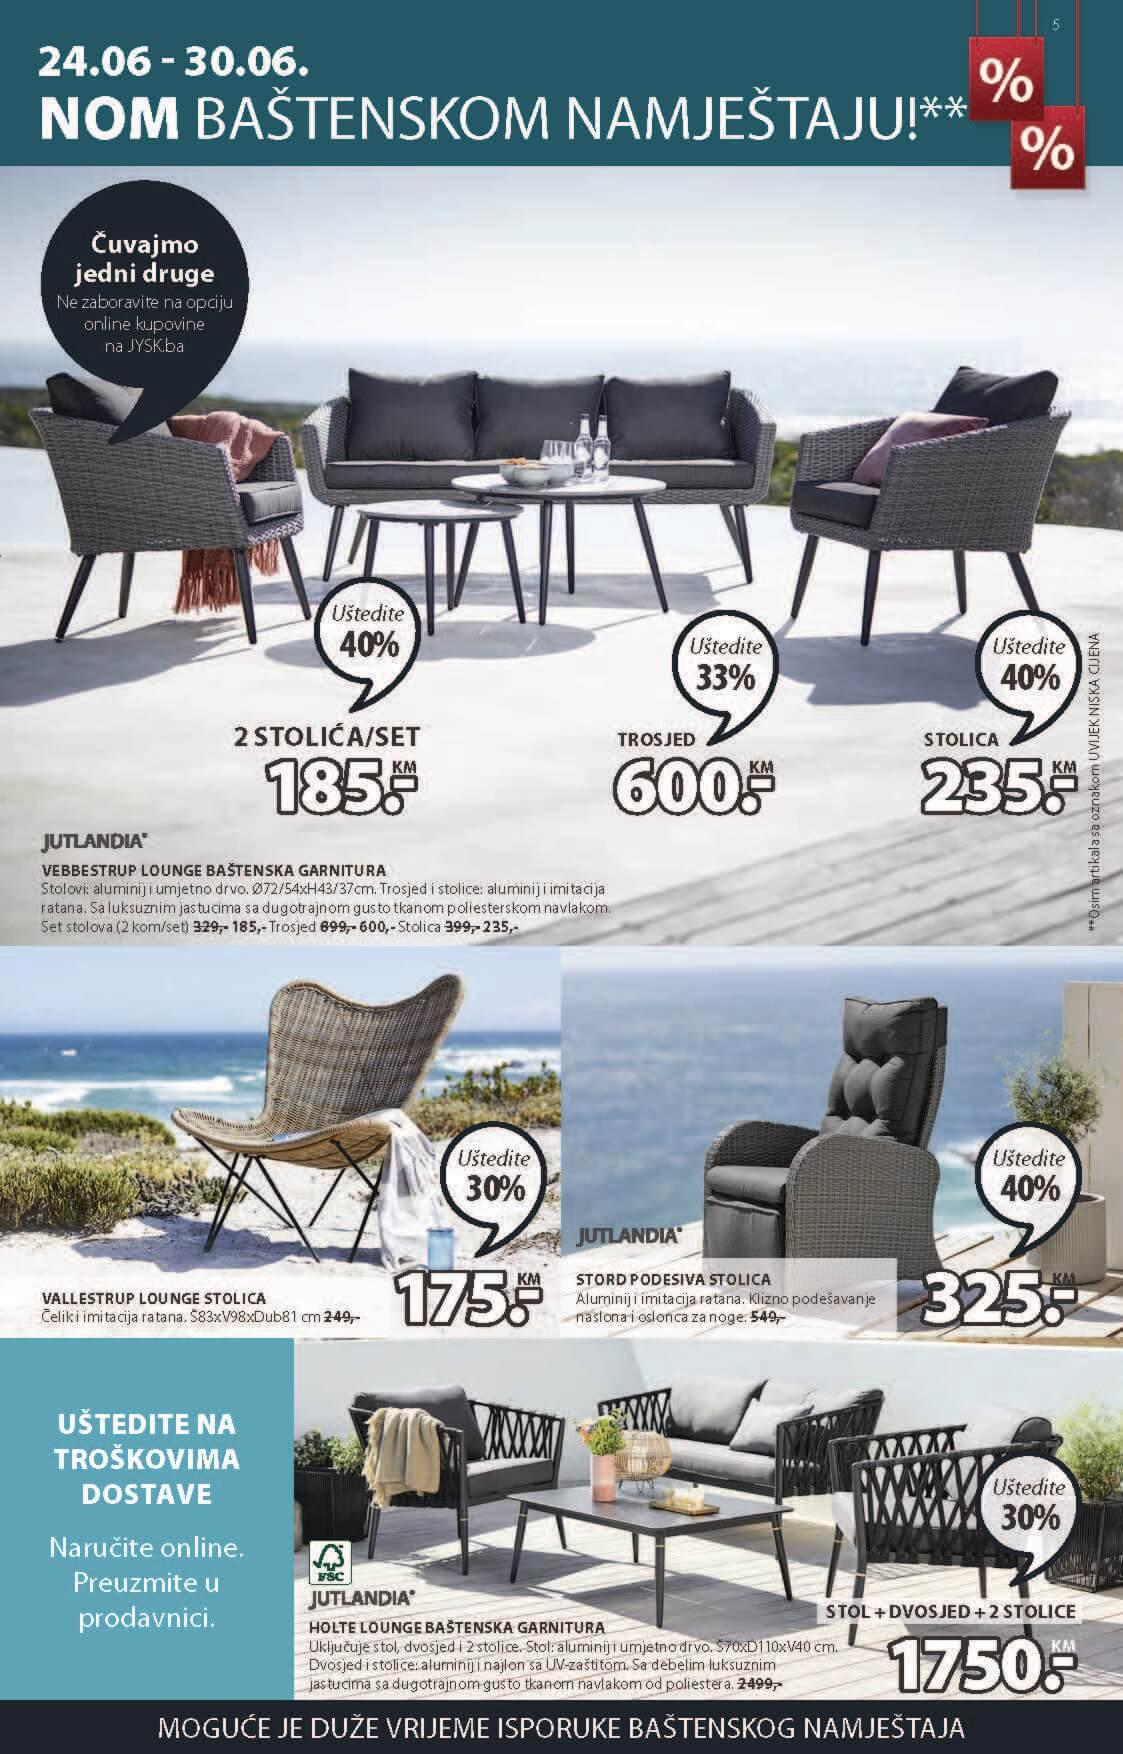 JYSK Katalog Akcijska rasprodaja JUN JUL 2021 24.6. 7.7. Page 06